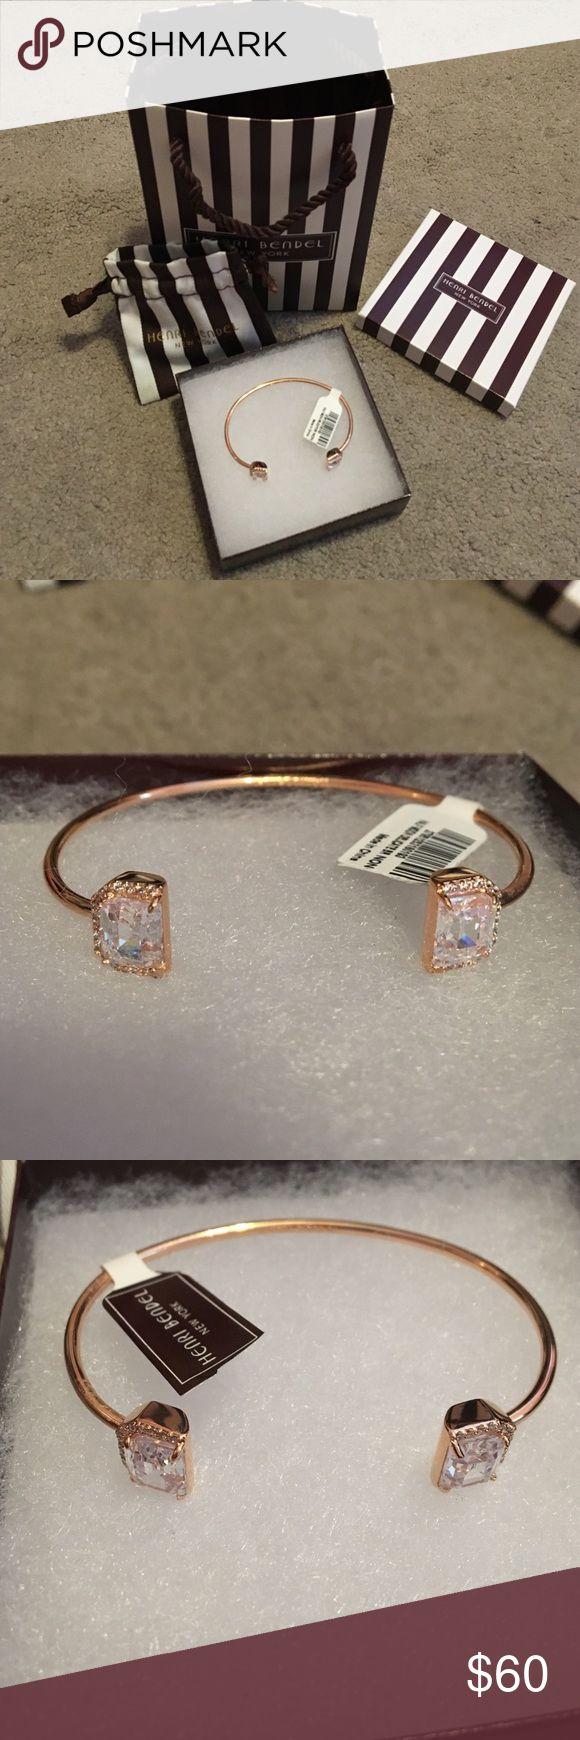 NWT Half Moon Henri Bendel Bracelet New with tags! Half Moon Henri Bendel Bracelet henri bendel Jewelry Bracelets